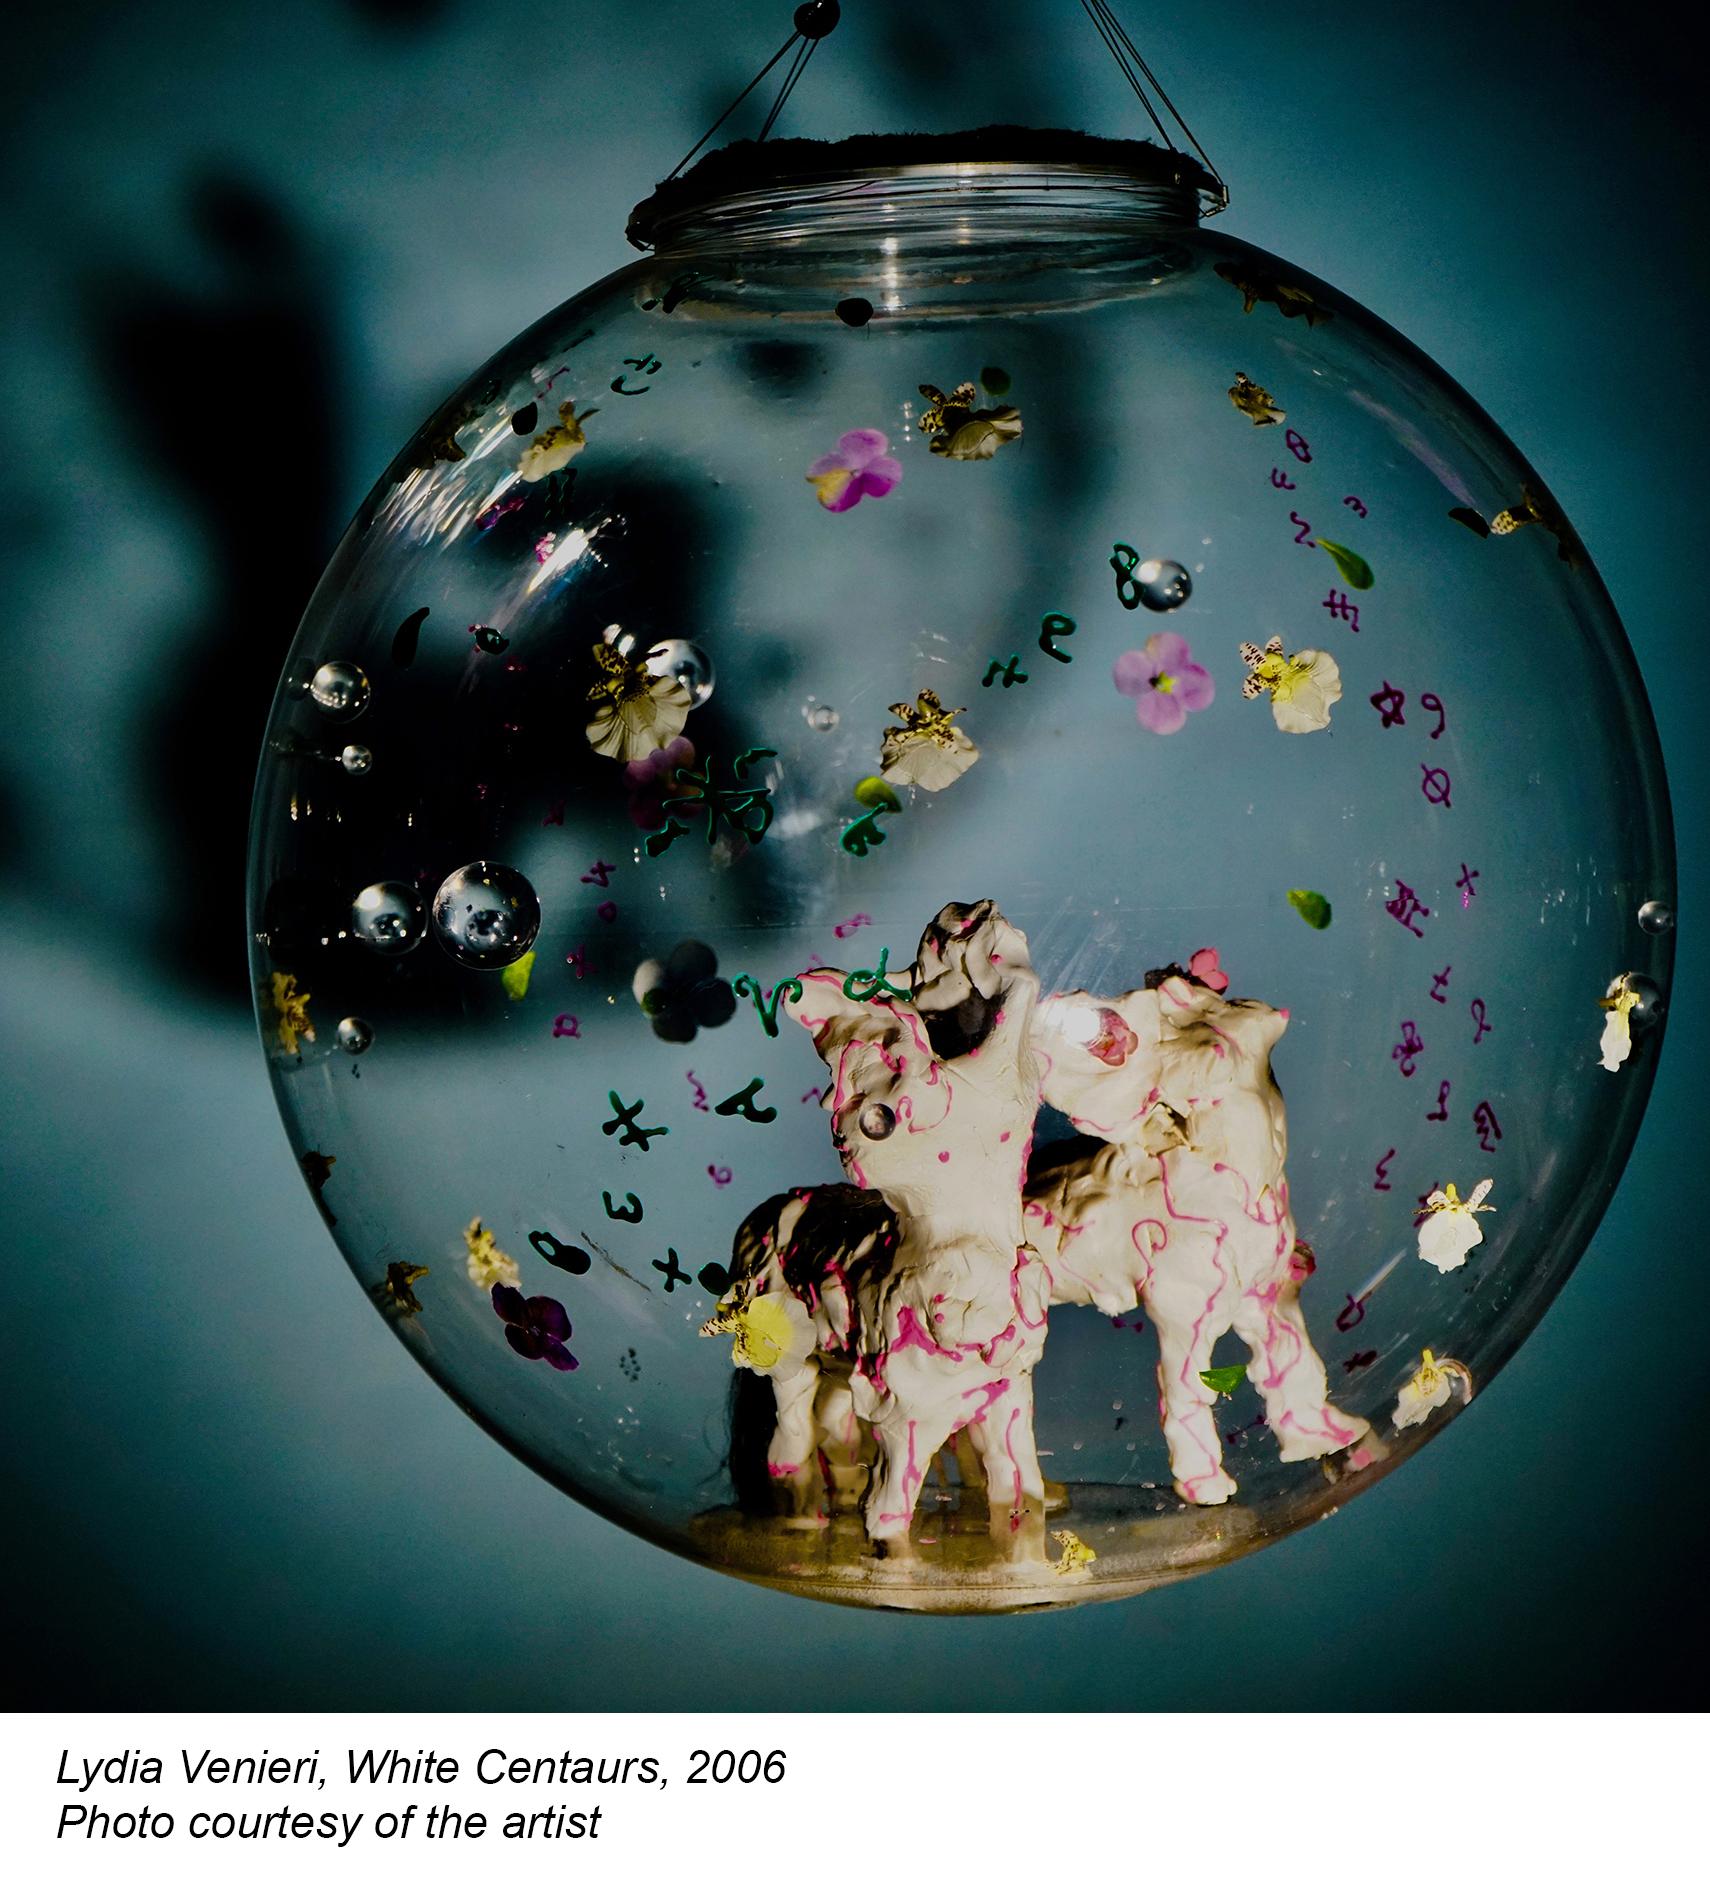 05-Venieri-Lydia_White-Centaurs-2006_title.jpg